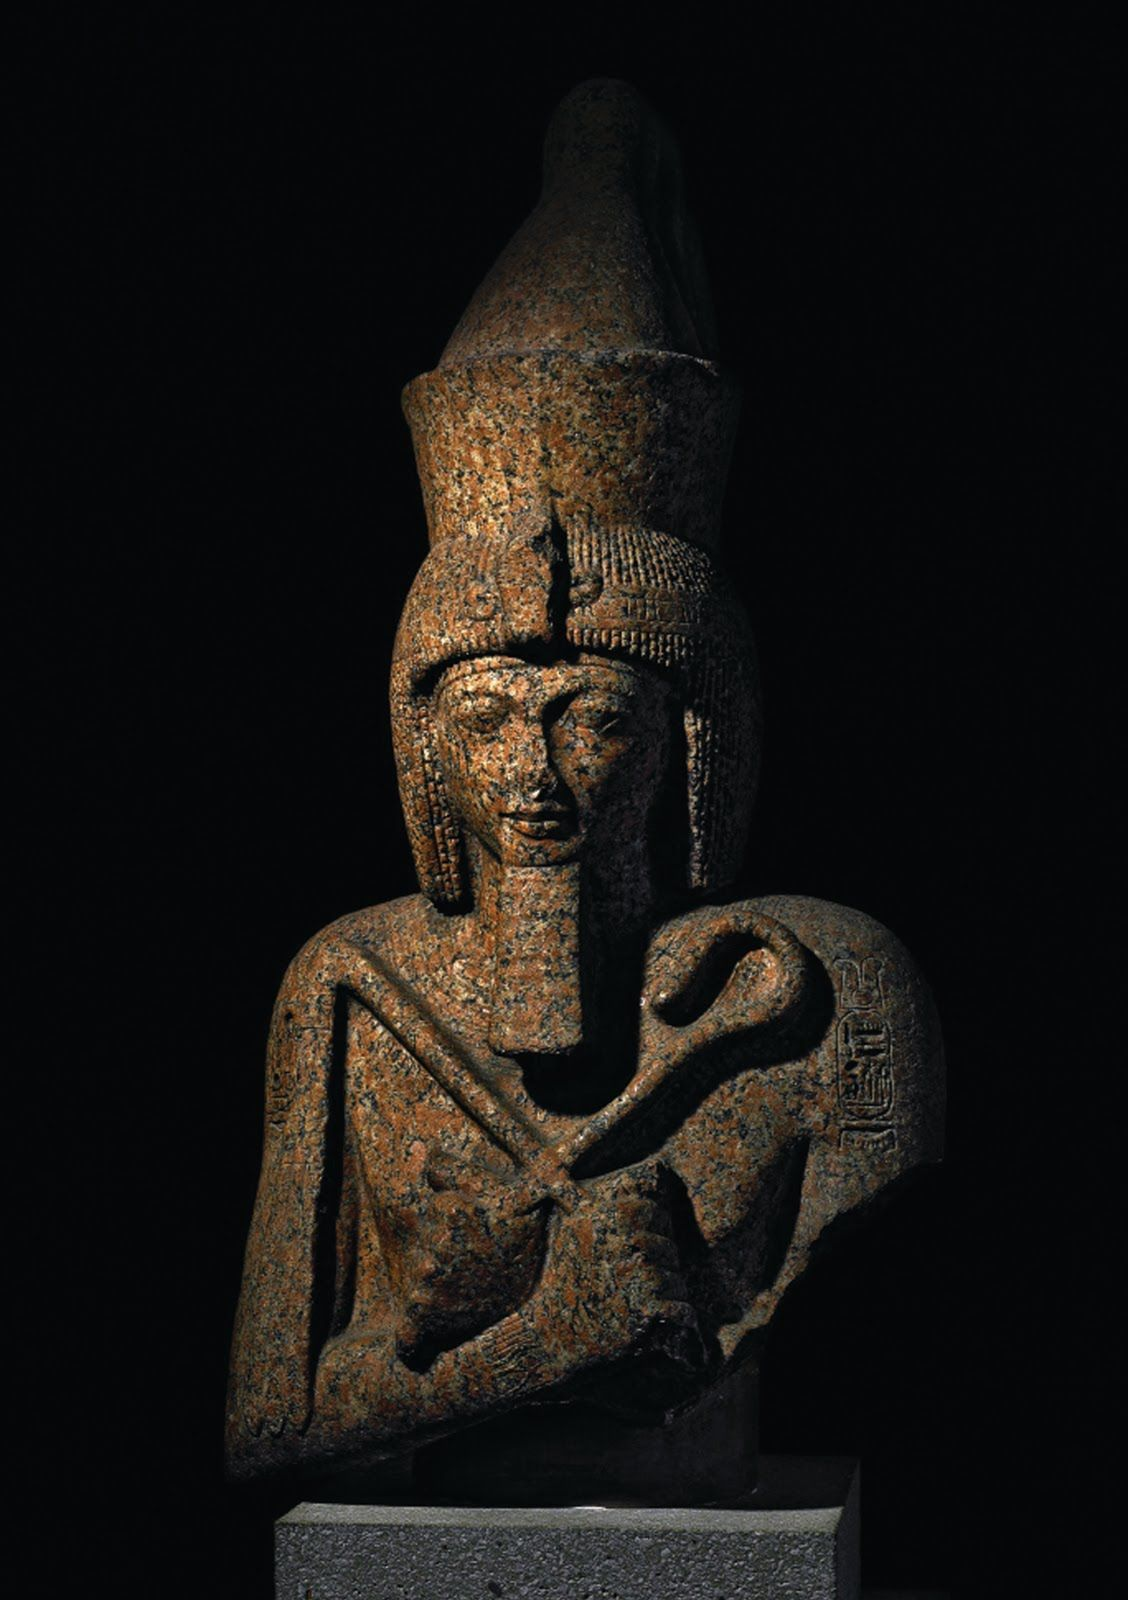 The Ancient Egyptian Granite Statue Of Pharaoh Ramses Ii